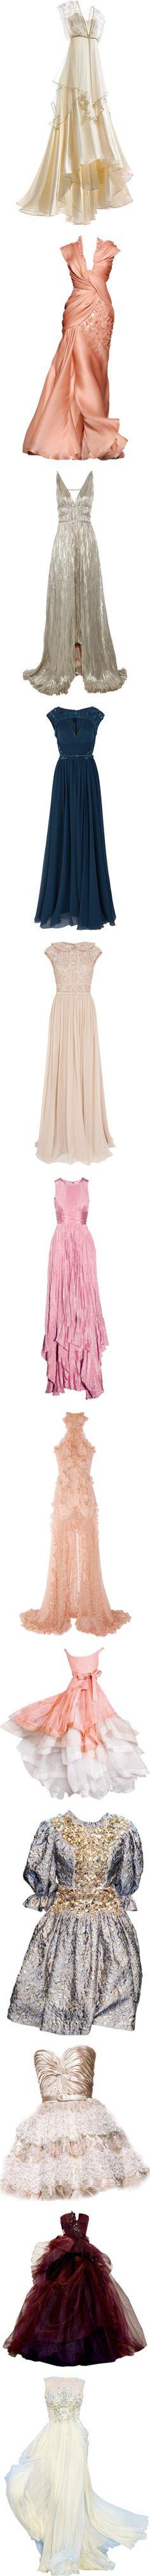 """Fabulous Princess Dresses"" by princess-hillary ❤ liked on Polyvore"